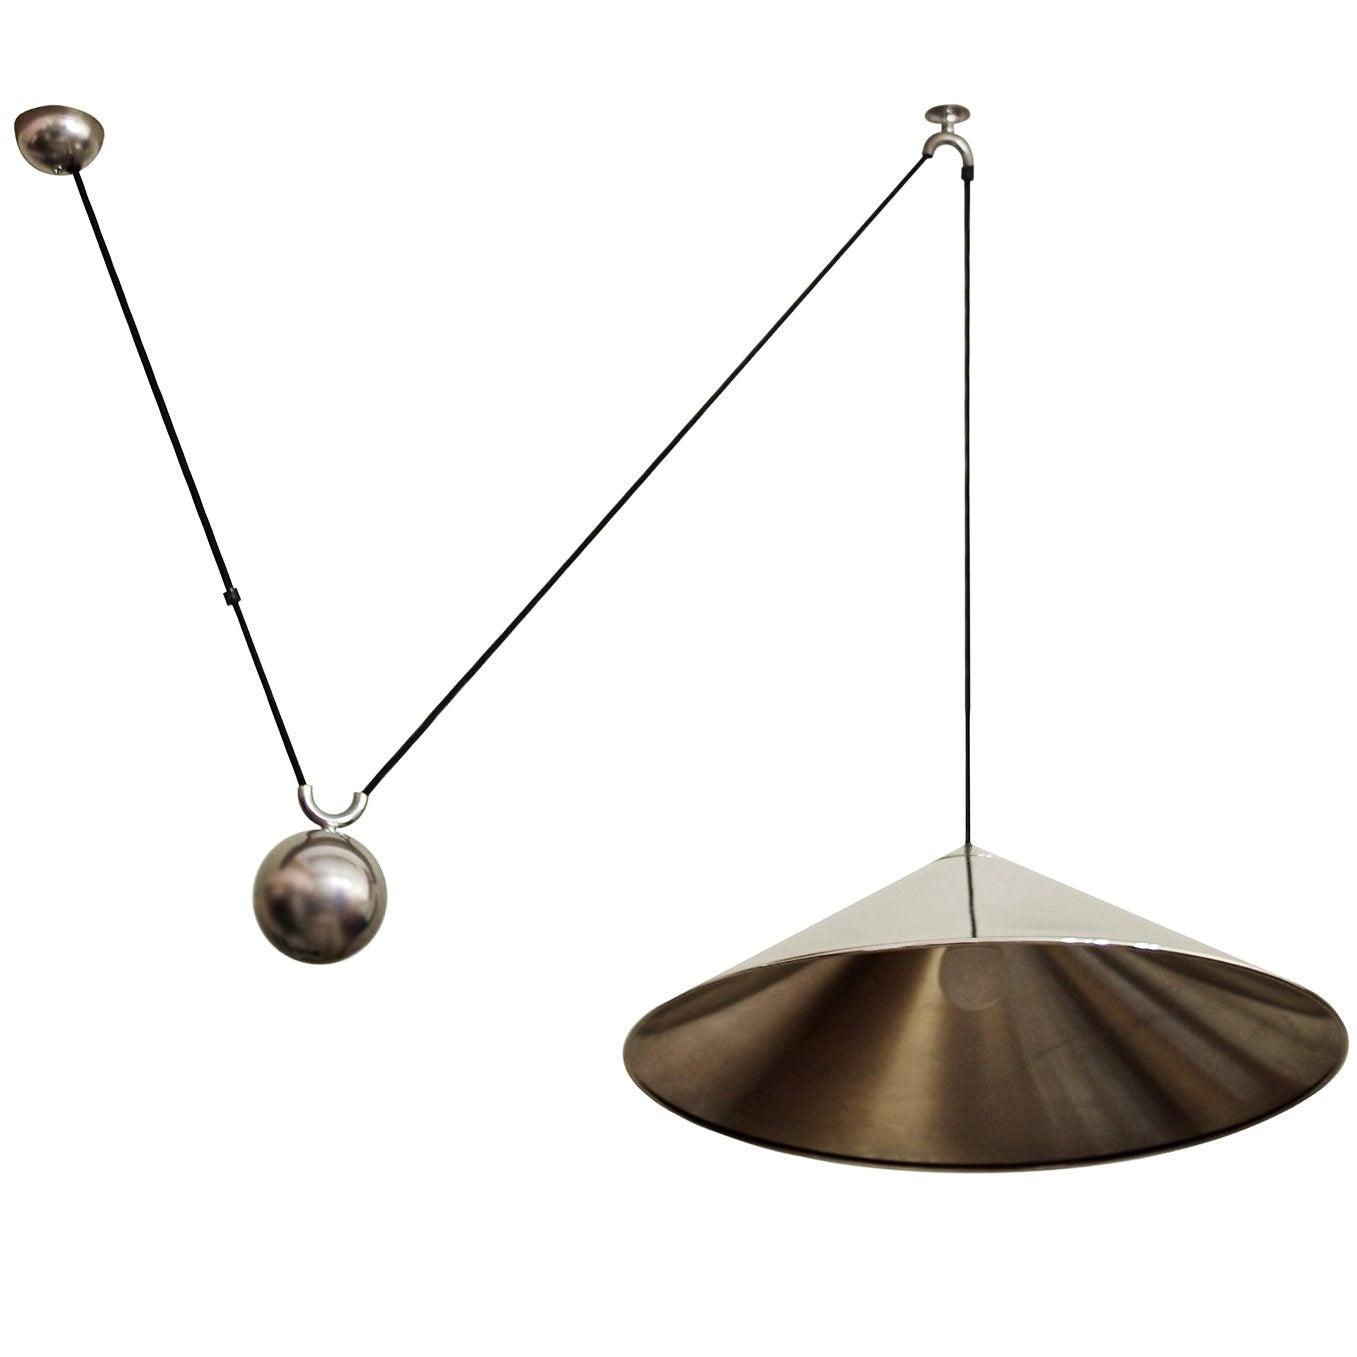 Large German Vintage Adjustable Counterweight Pendant Lamp by Florian Schulz